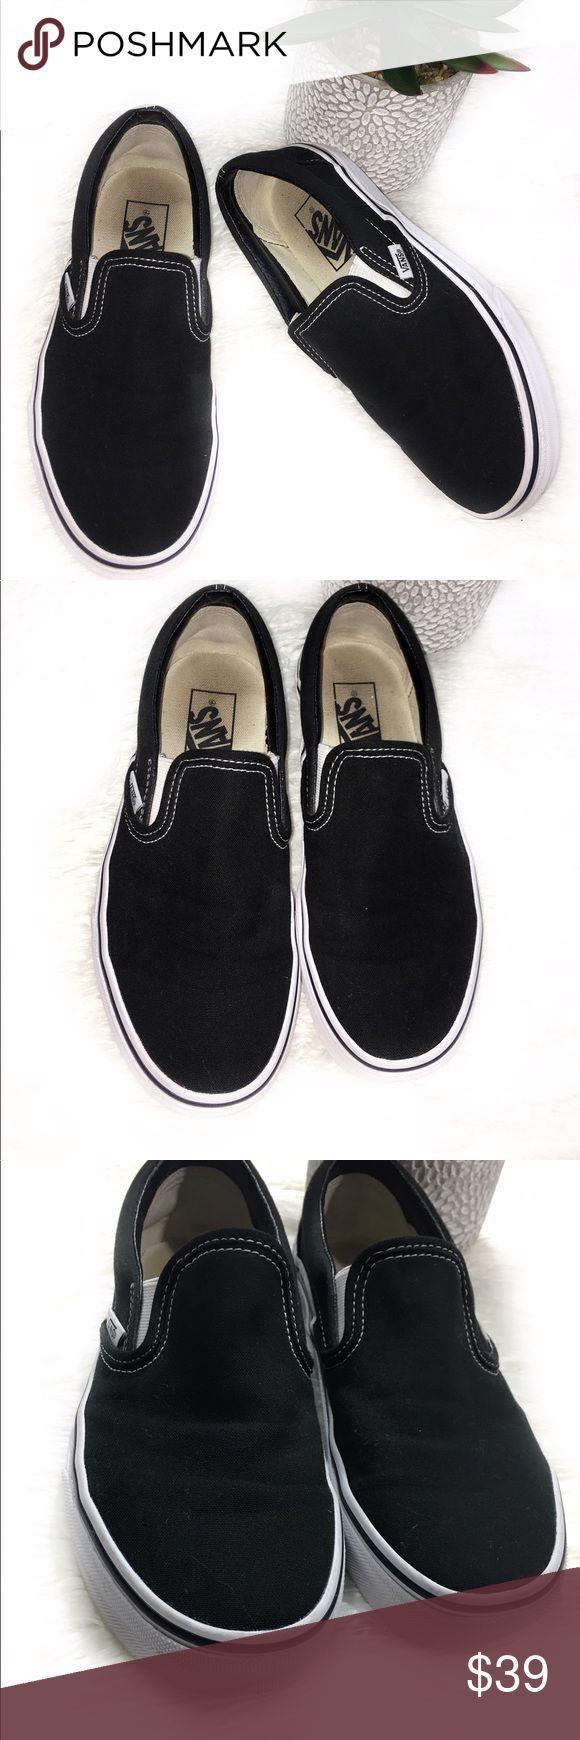 Vans Slip On Shoes Vans black slip on shoes in EUC no visible flaws. Vans Shoes Sneakers